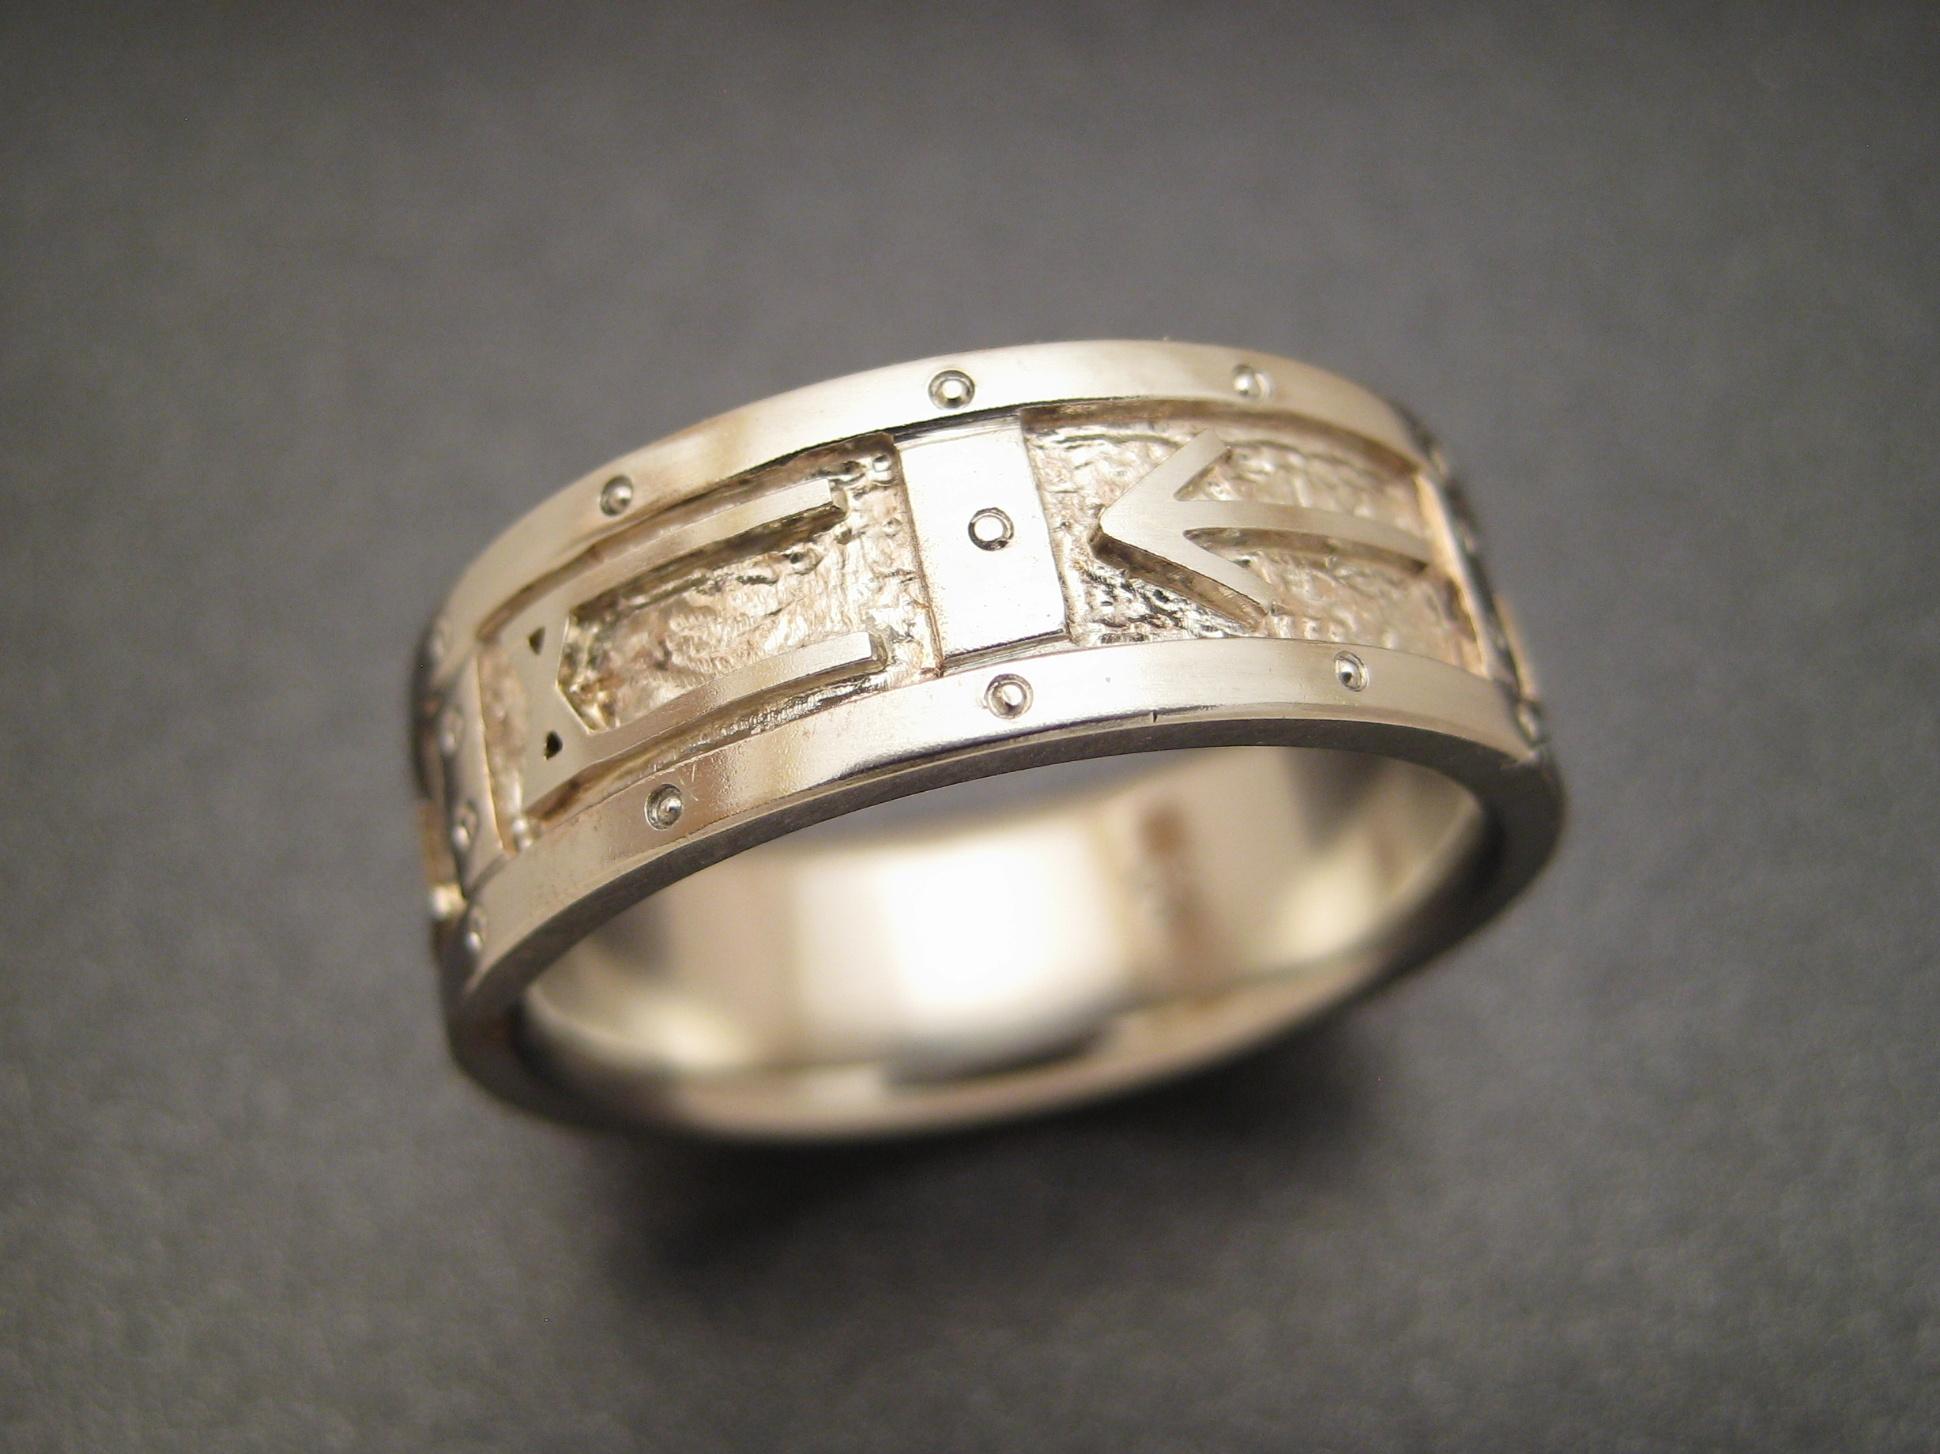 Norse Rune Wedding Ring Patrick Burt Sculpted Jewelry Designs